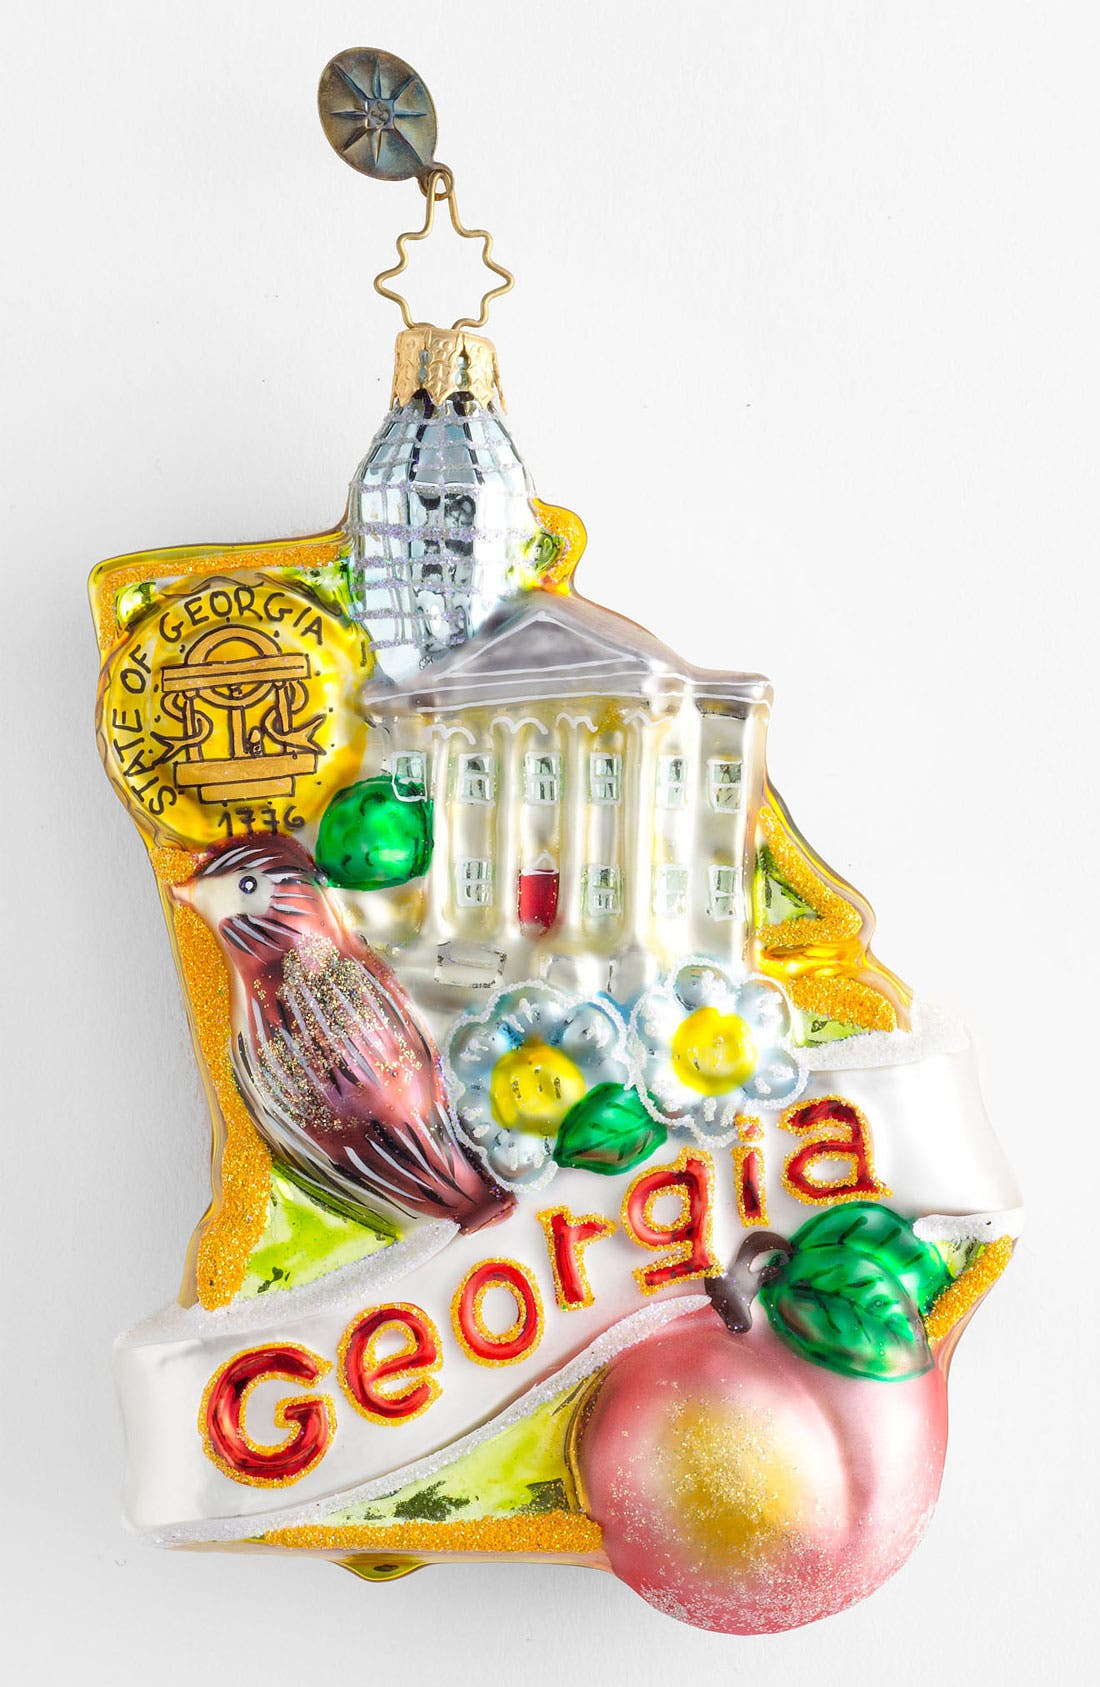 Main Image - Christopher Radko 'Georgia on My Mind' Ornament